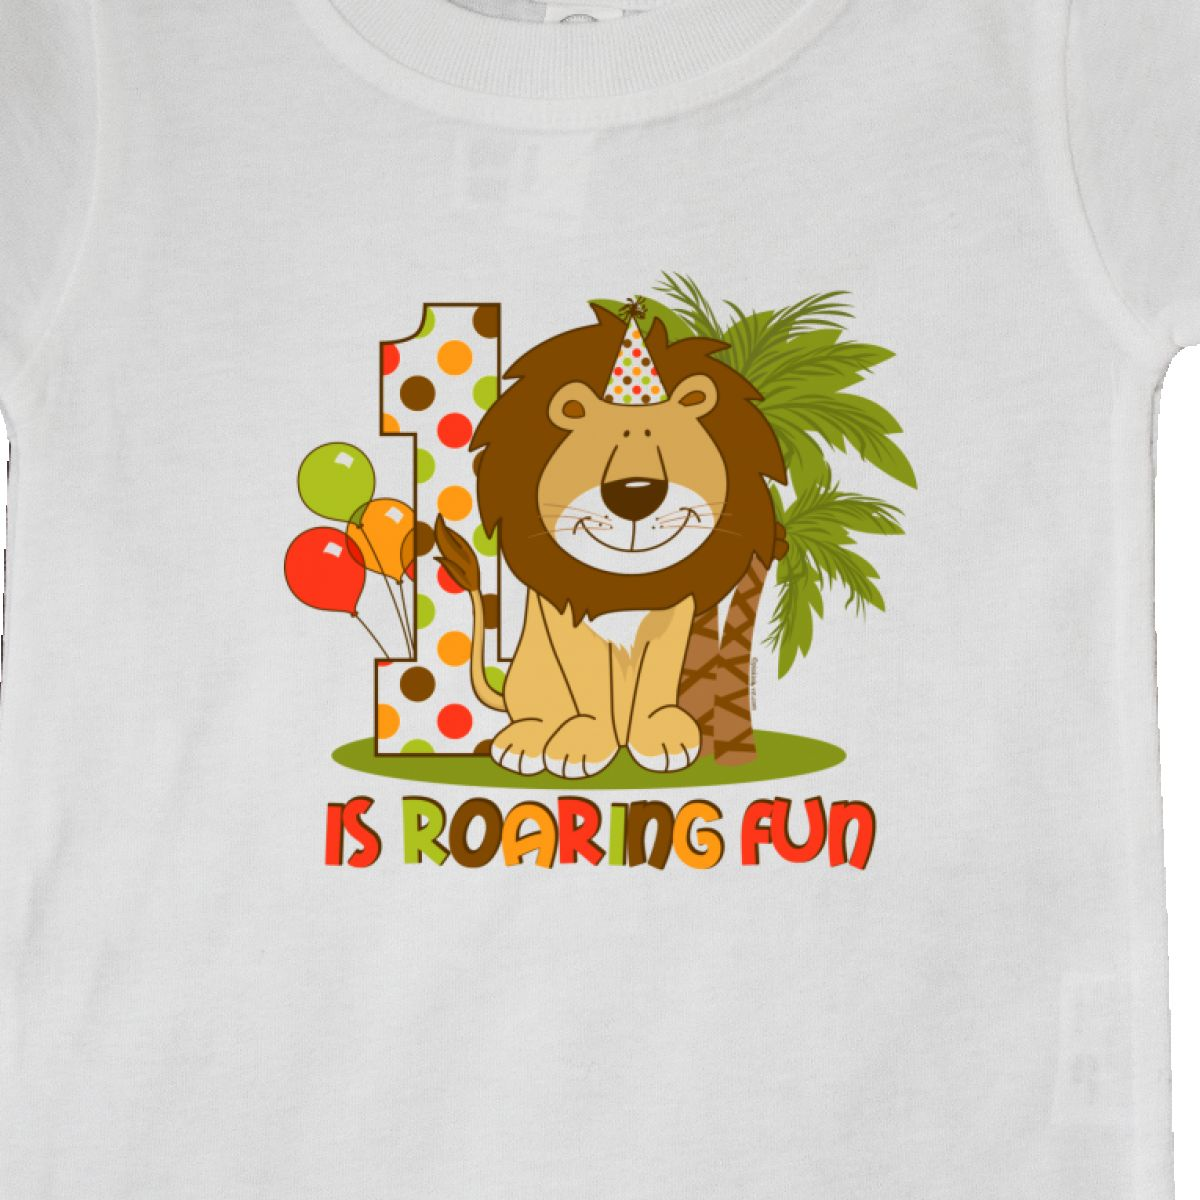 Inktastic-Cute-Lion-1st-Birthday-Baby-T-Shirt-Roaring-Fun-Pinkinkartkids-First thumbnail 22